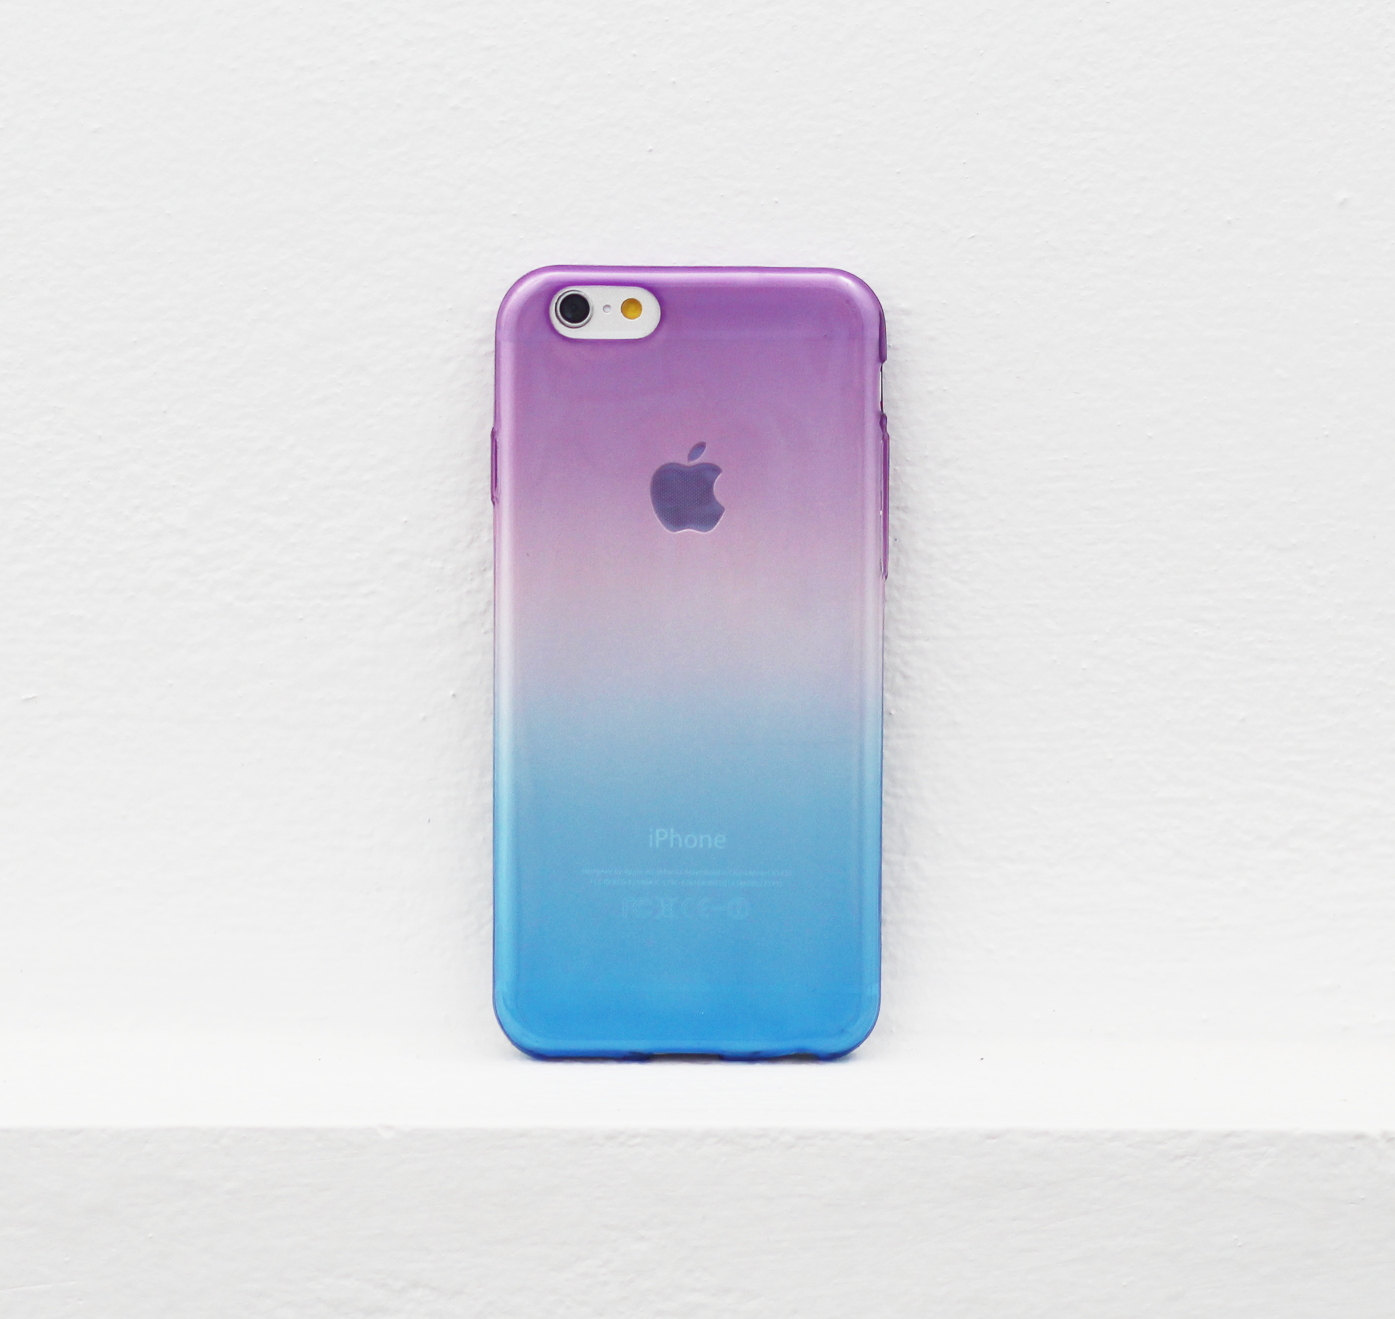 new product ed80a 7e766 Ombre iPhone case, purple iPhone 5 5s case, blue iPhone 6 6s case,  transparent iPhone 6 6s plus case, iPhone SE case